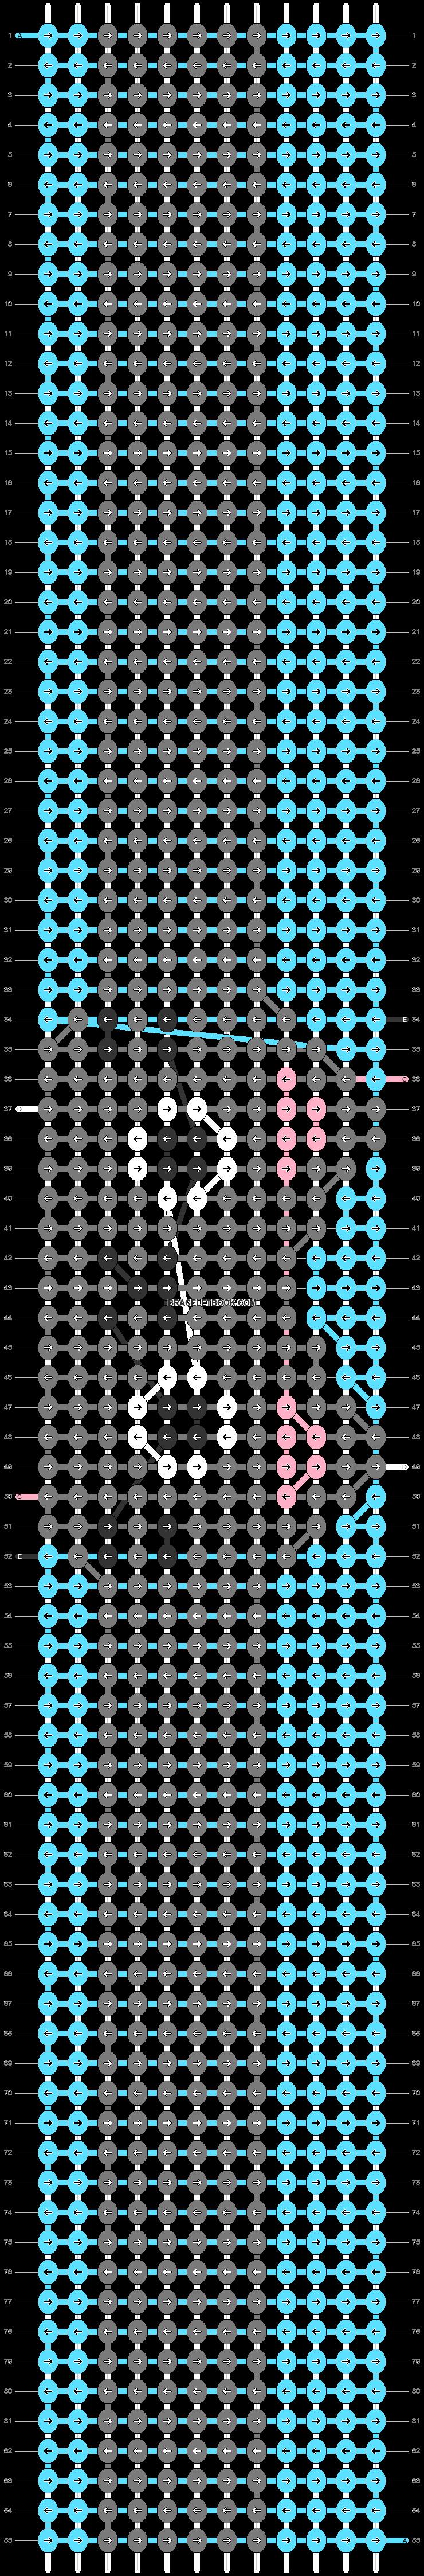 Alpha pattern #89842 variation #162269 pattern